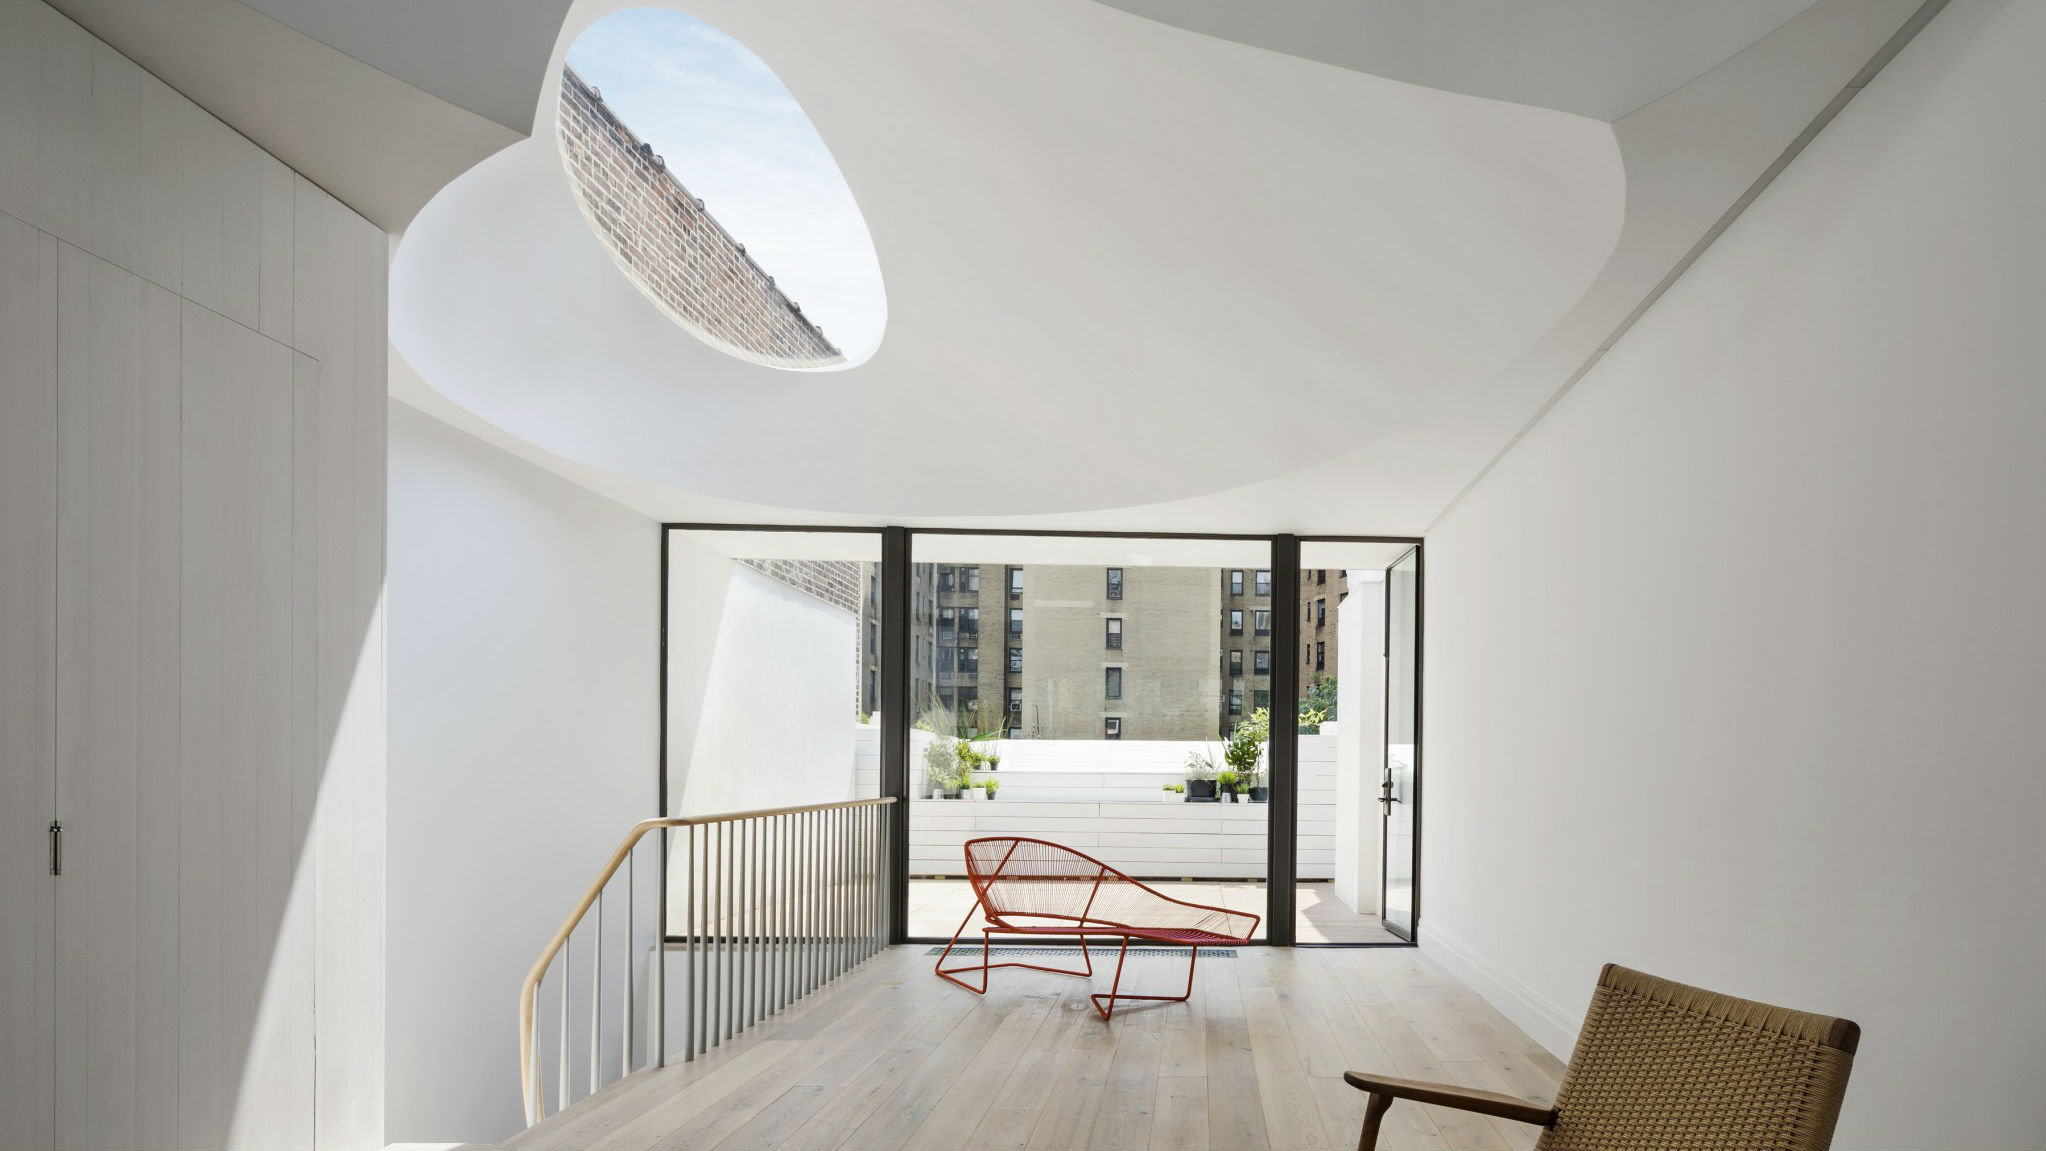 Oculi House by O'Neill Rose Architects